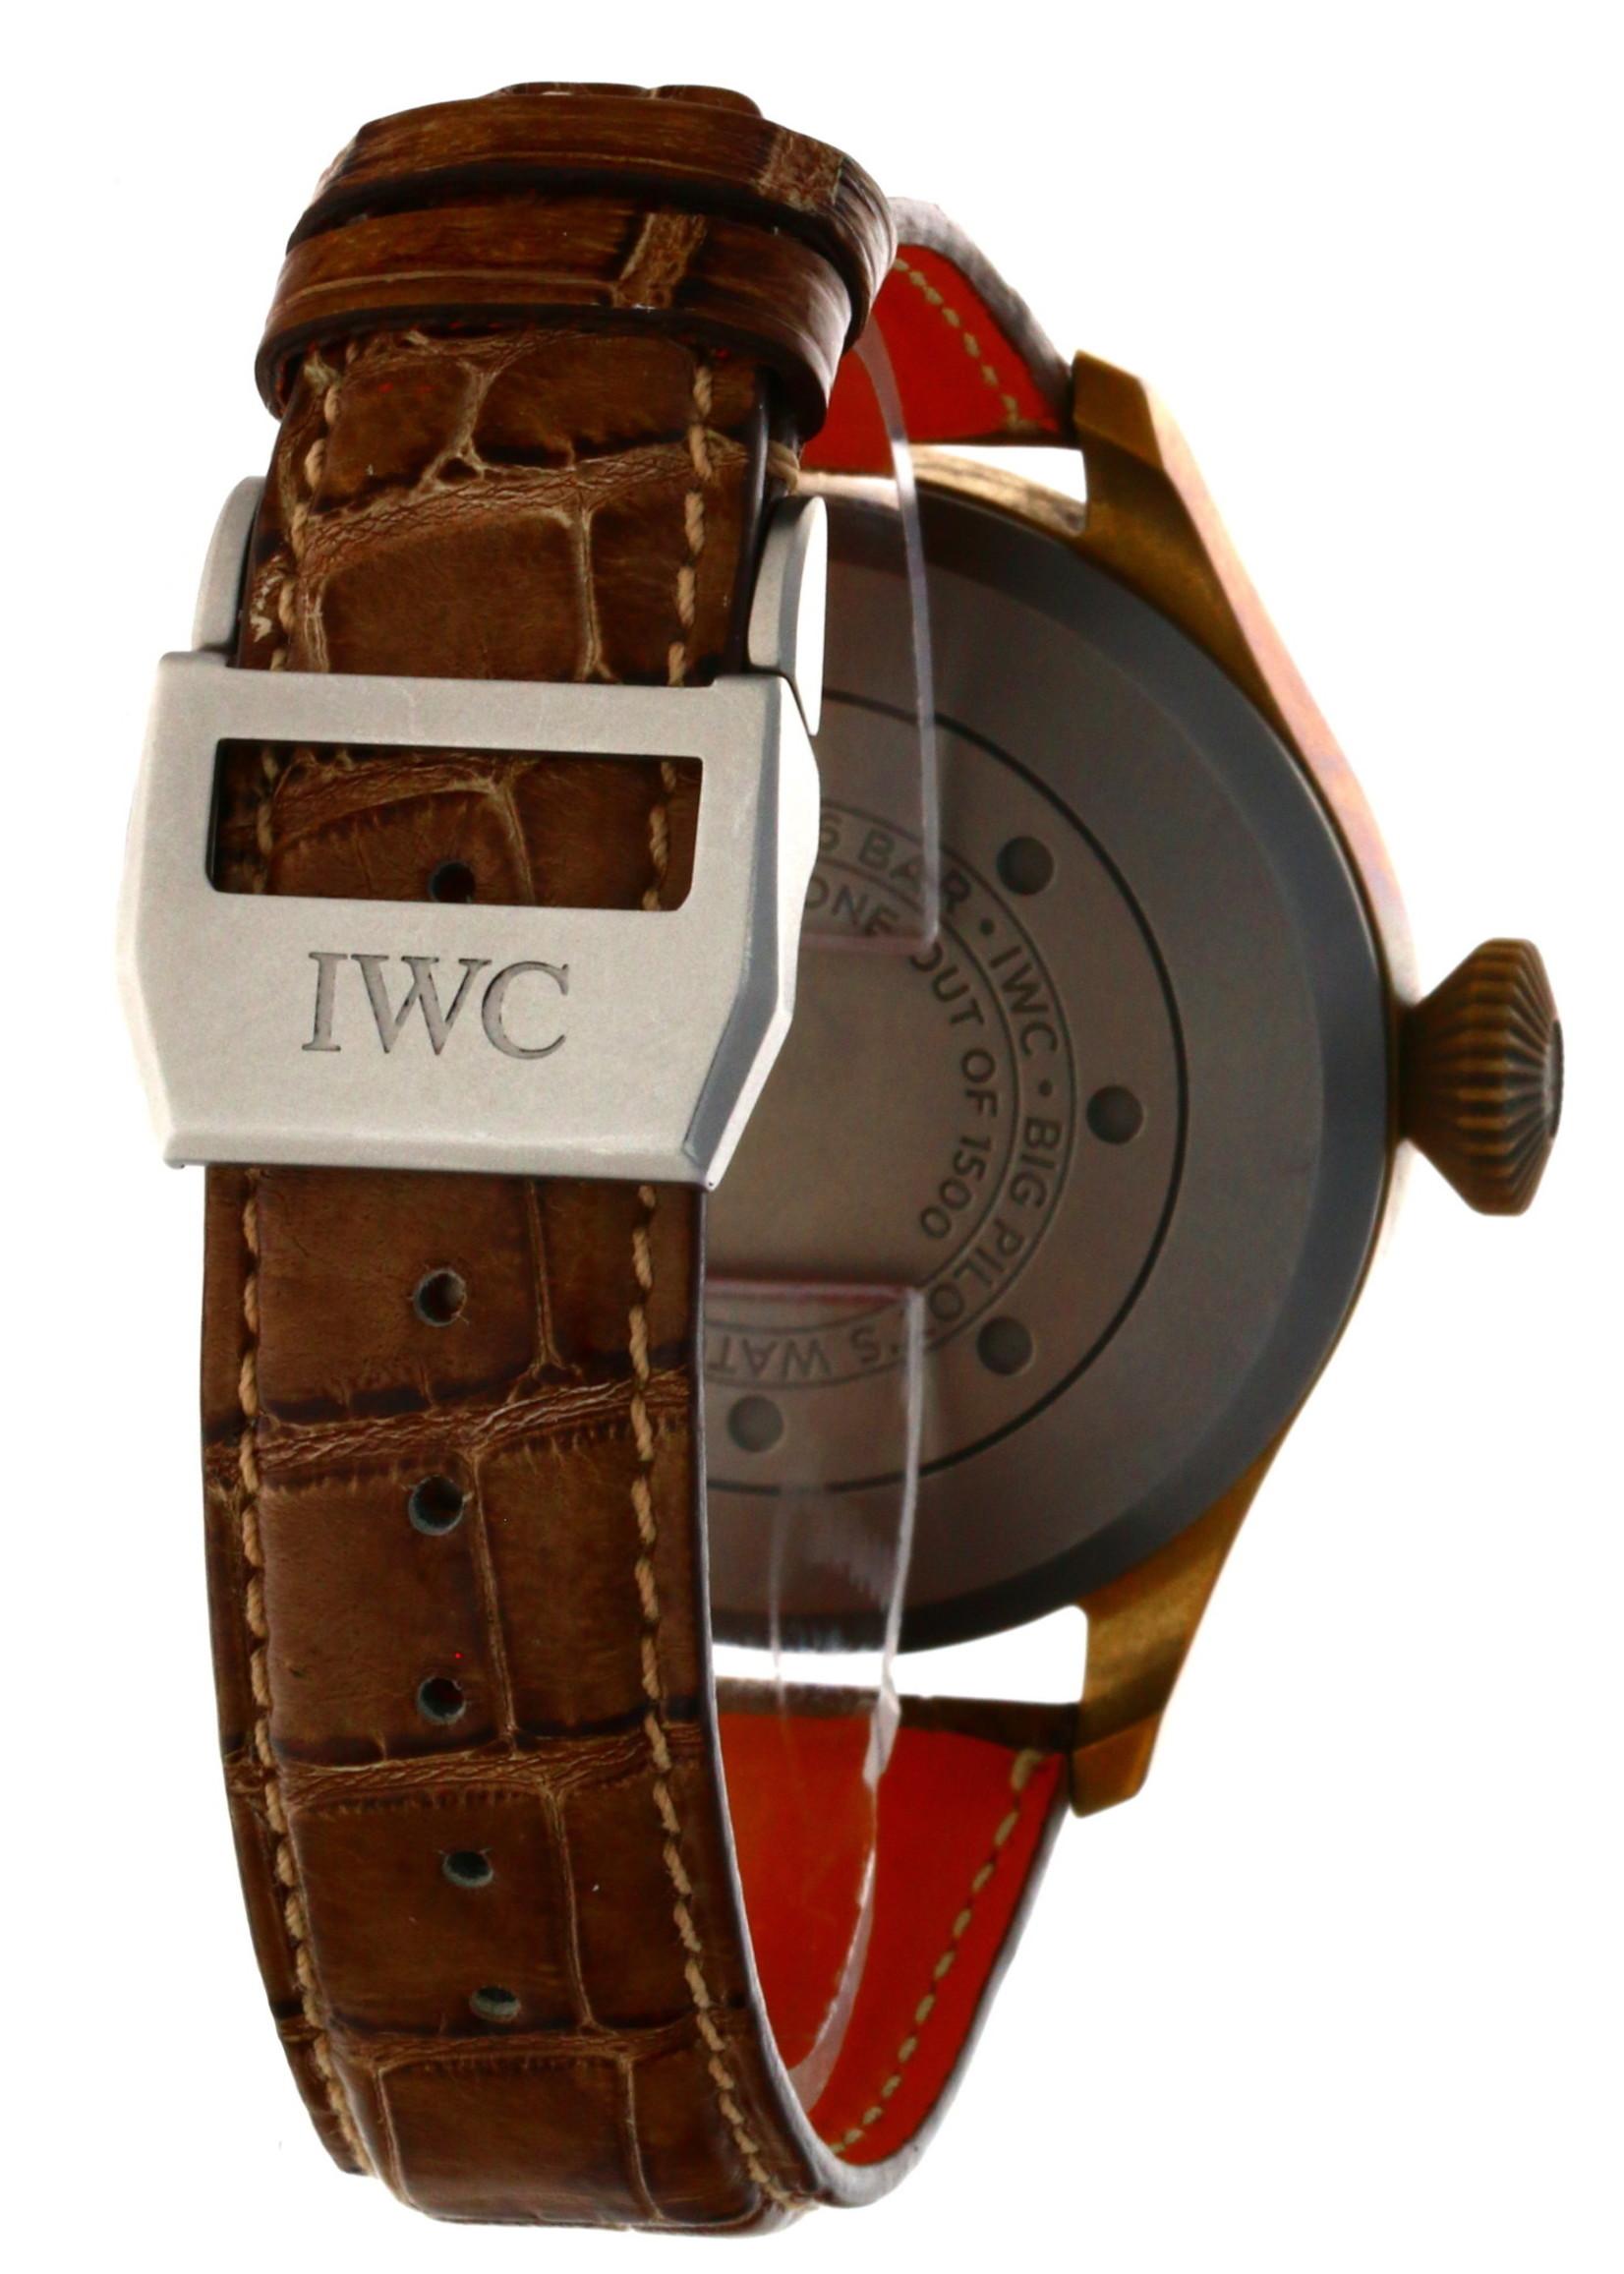 IWC IWC BIG PILOT HERITAGE (2018 B+P) #IW501005